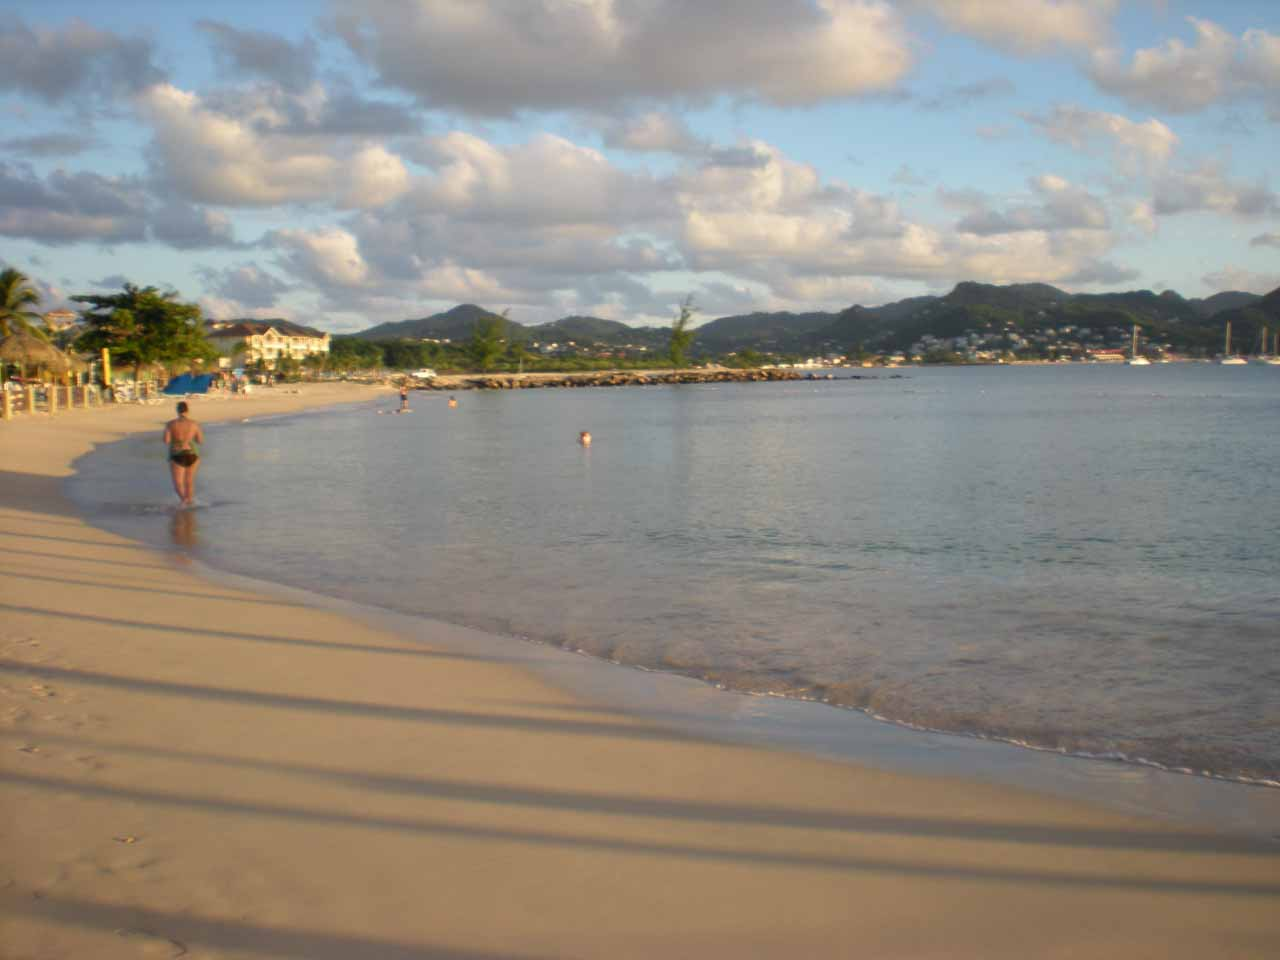 Beach at the Sandals Grande Resort